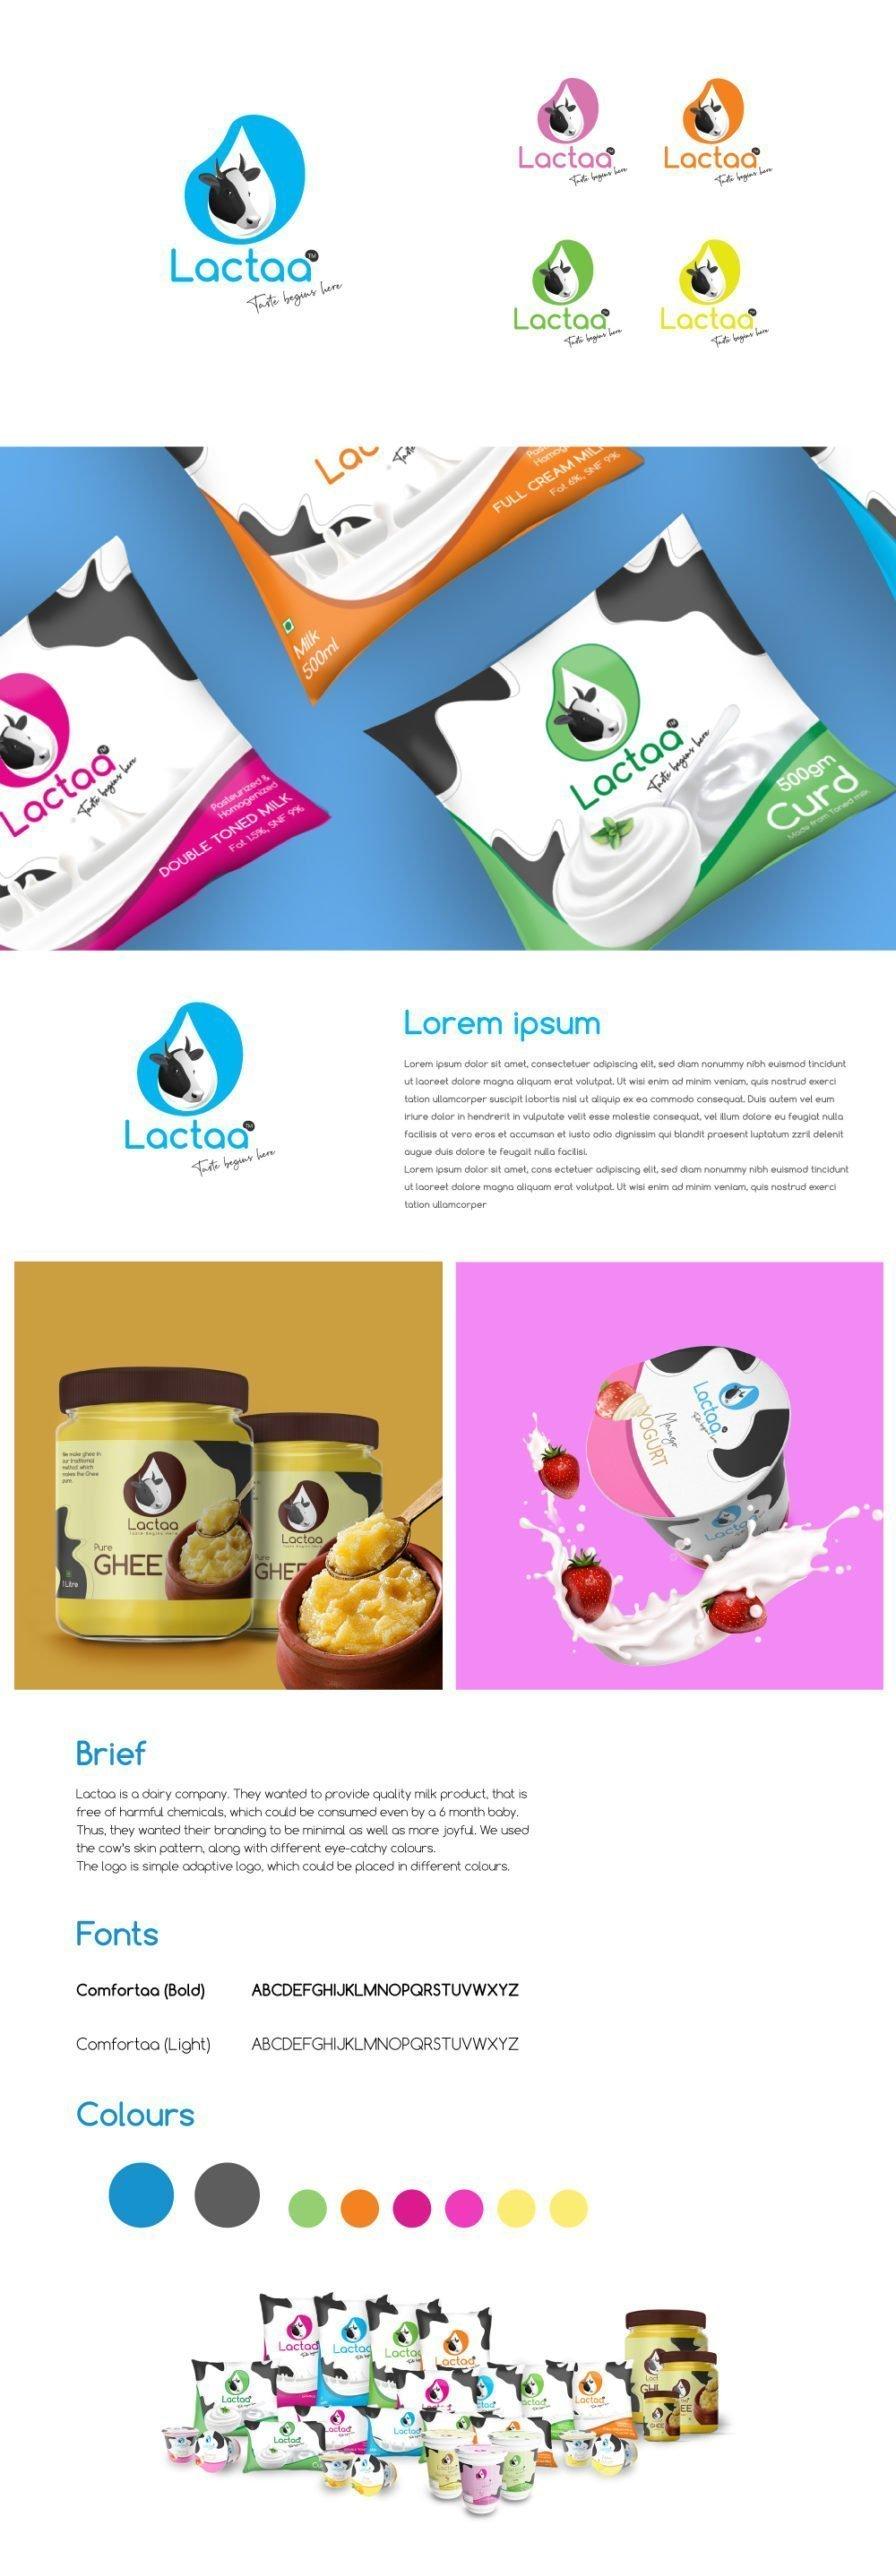 Lactaa Presentation scaled | Logo designer in Coimbatore